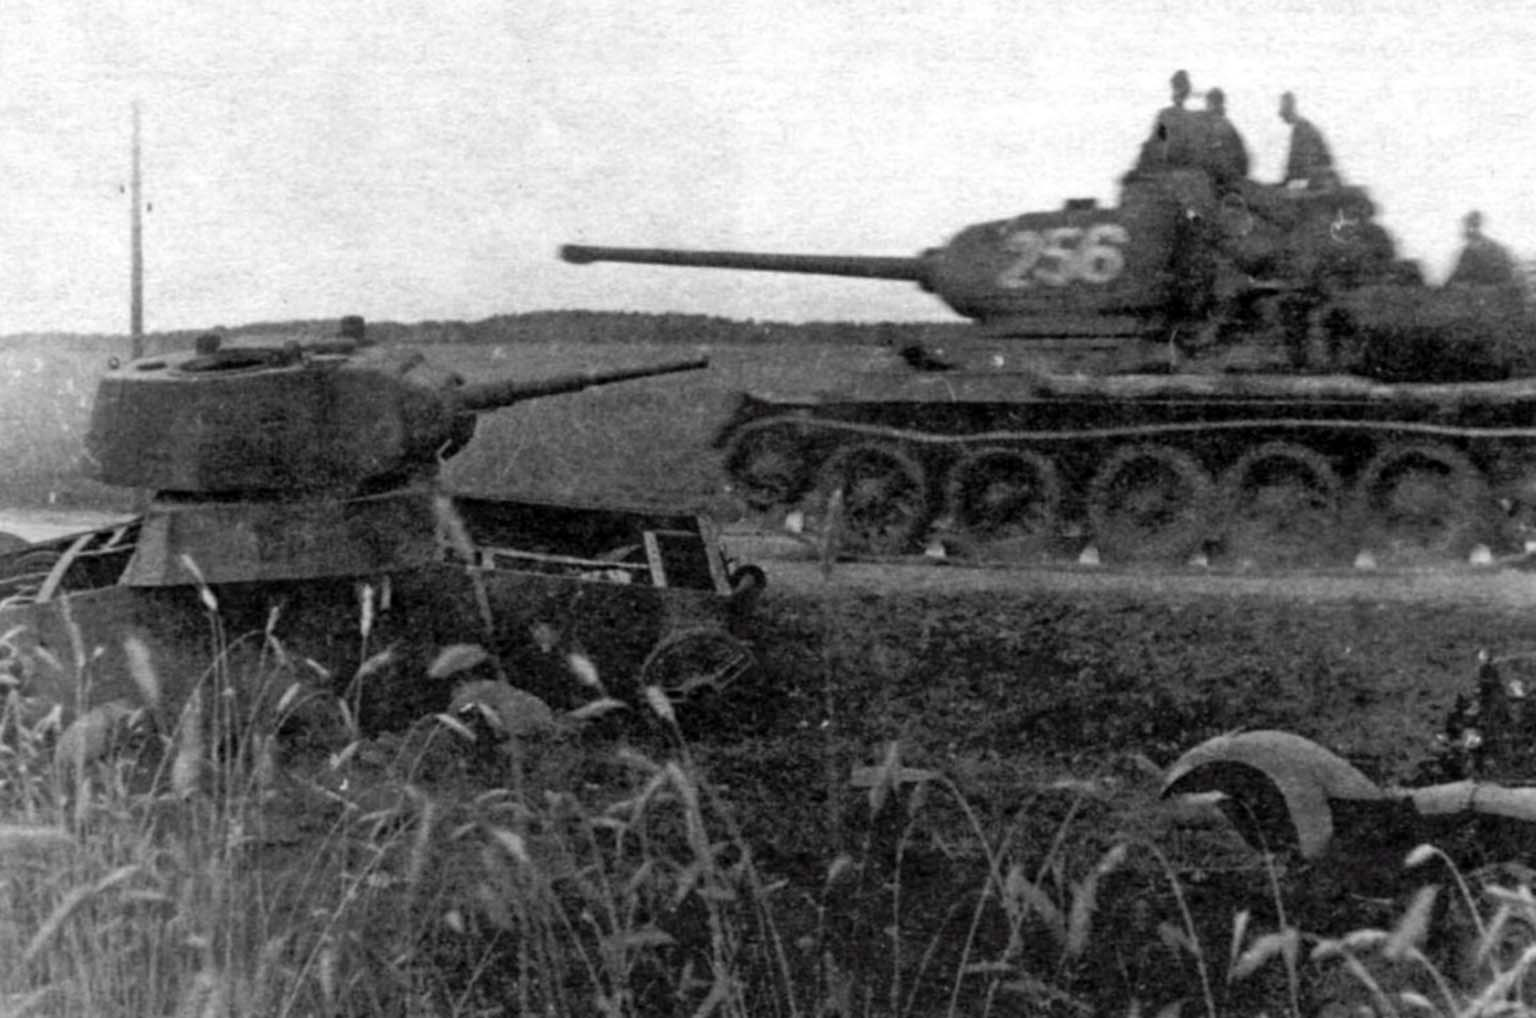 T-34-85, T-26